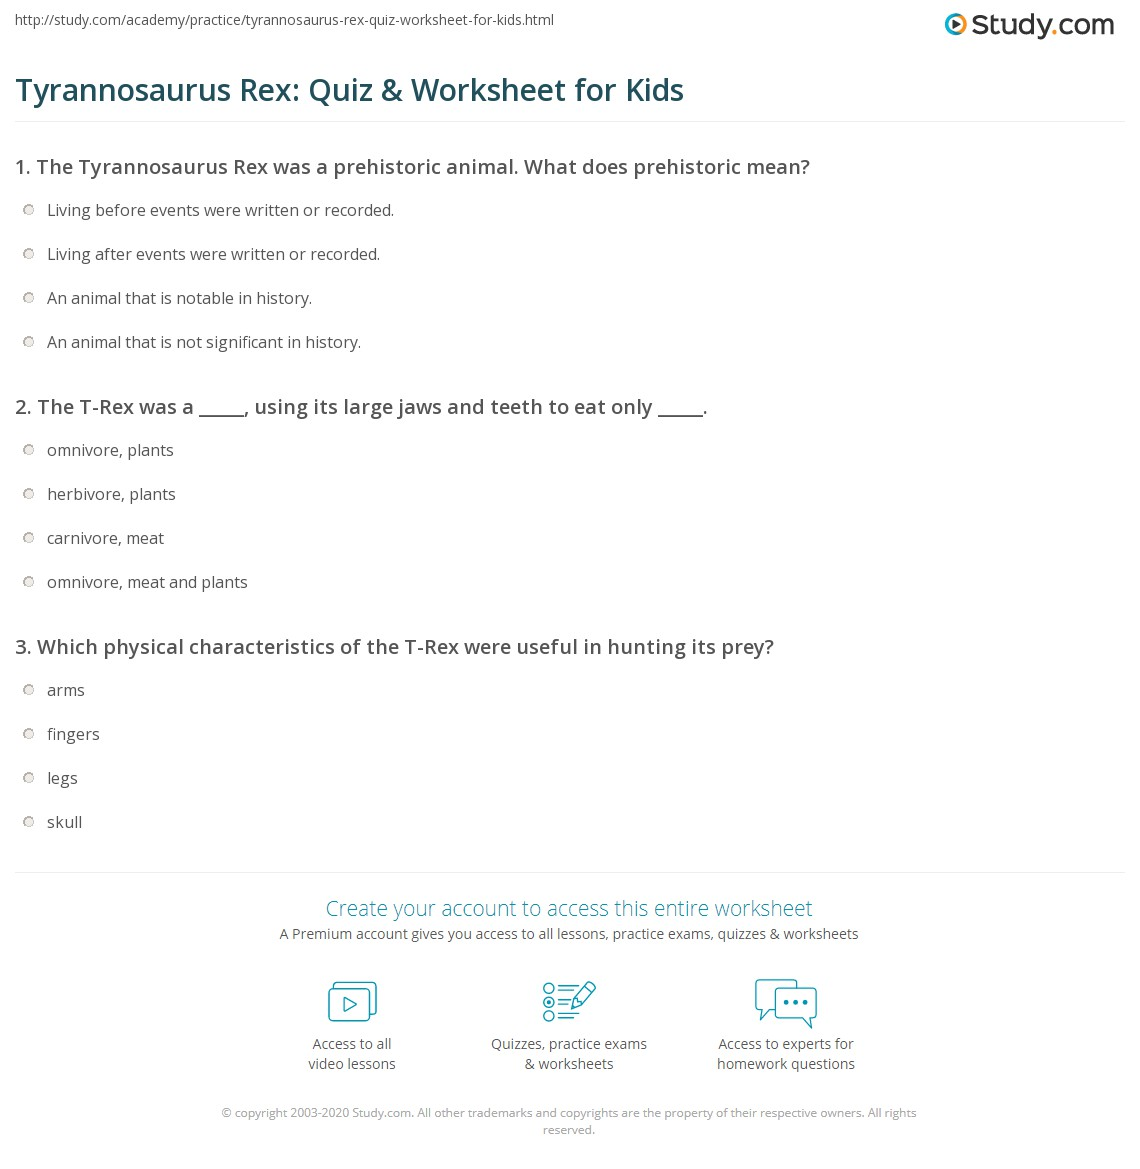 Tyrannosaurus Rex: Quiz & Worksheet for Kids | Study.com